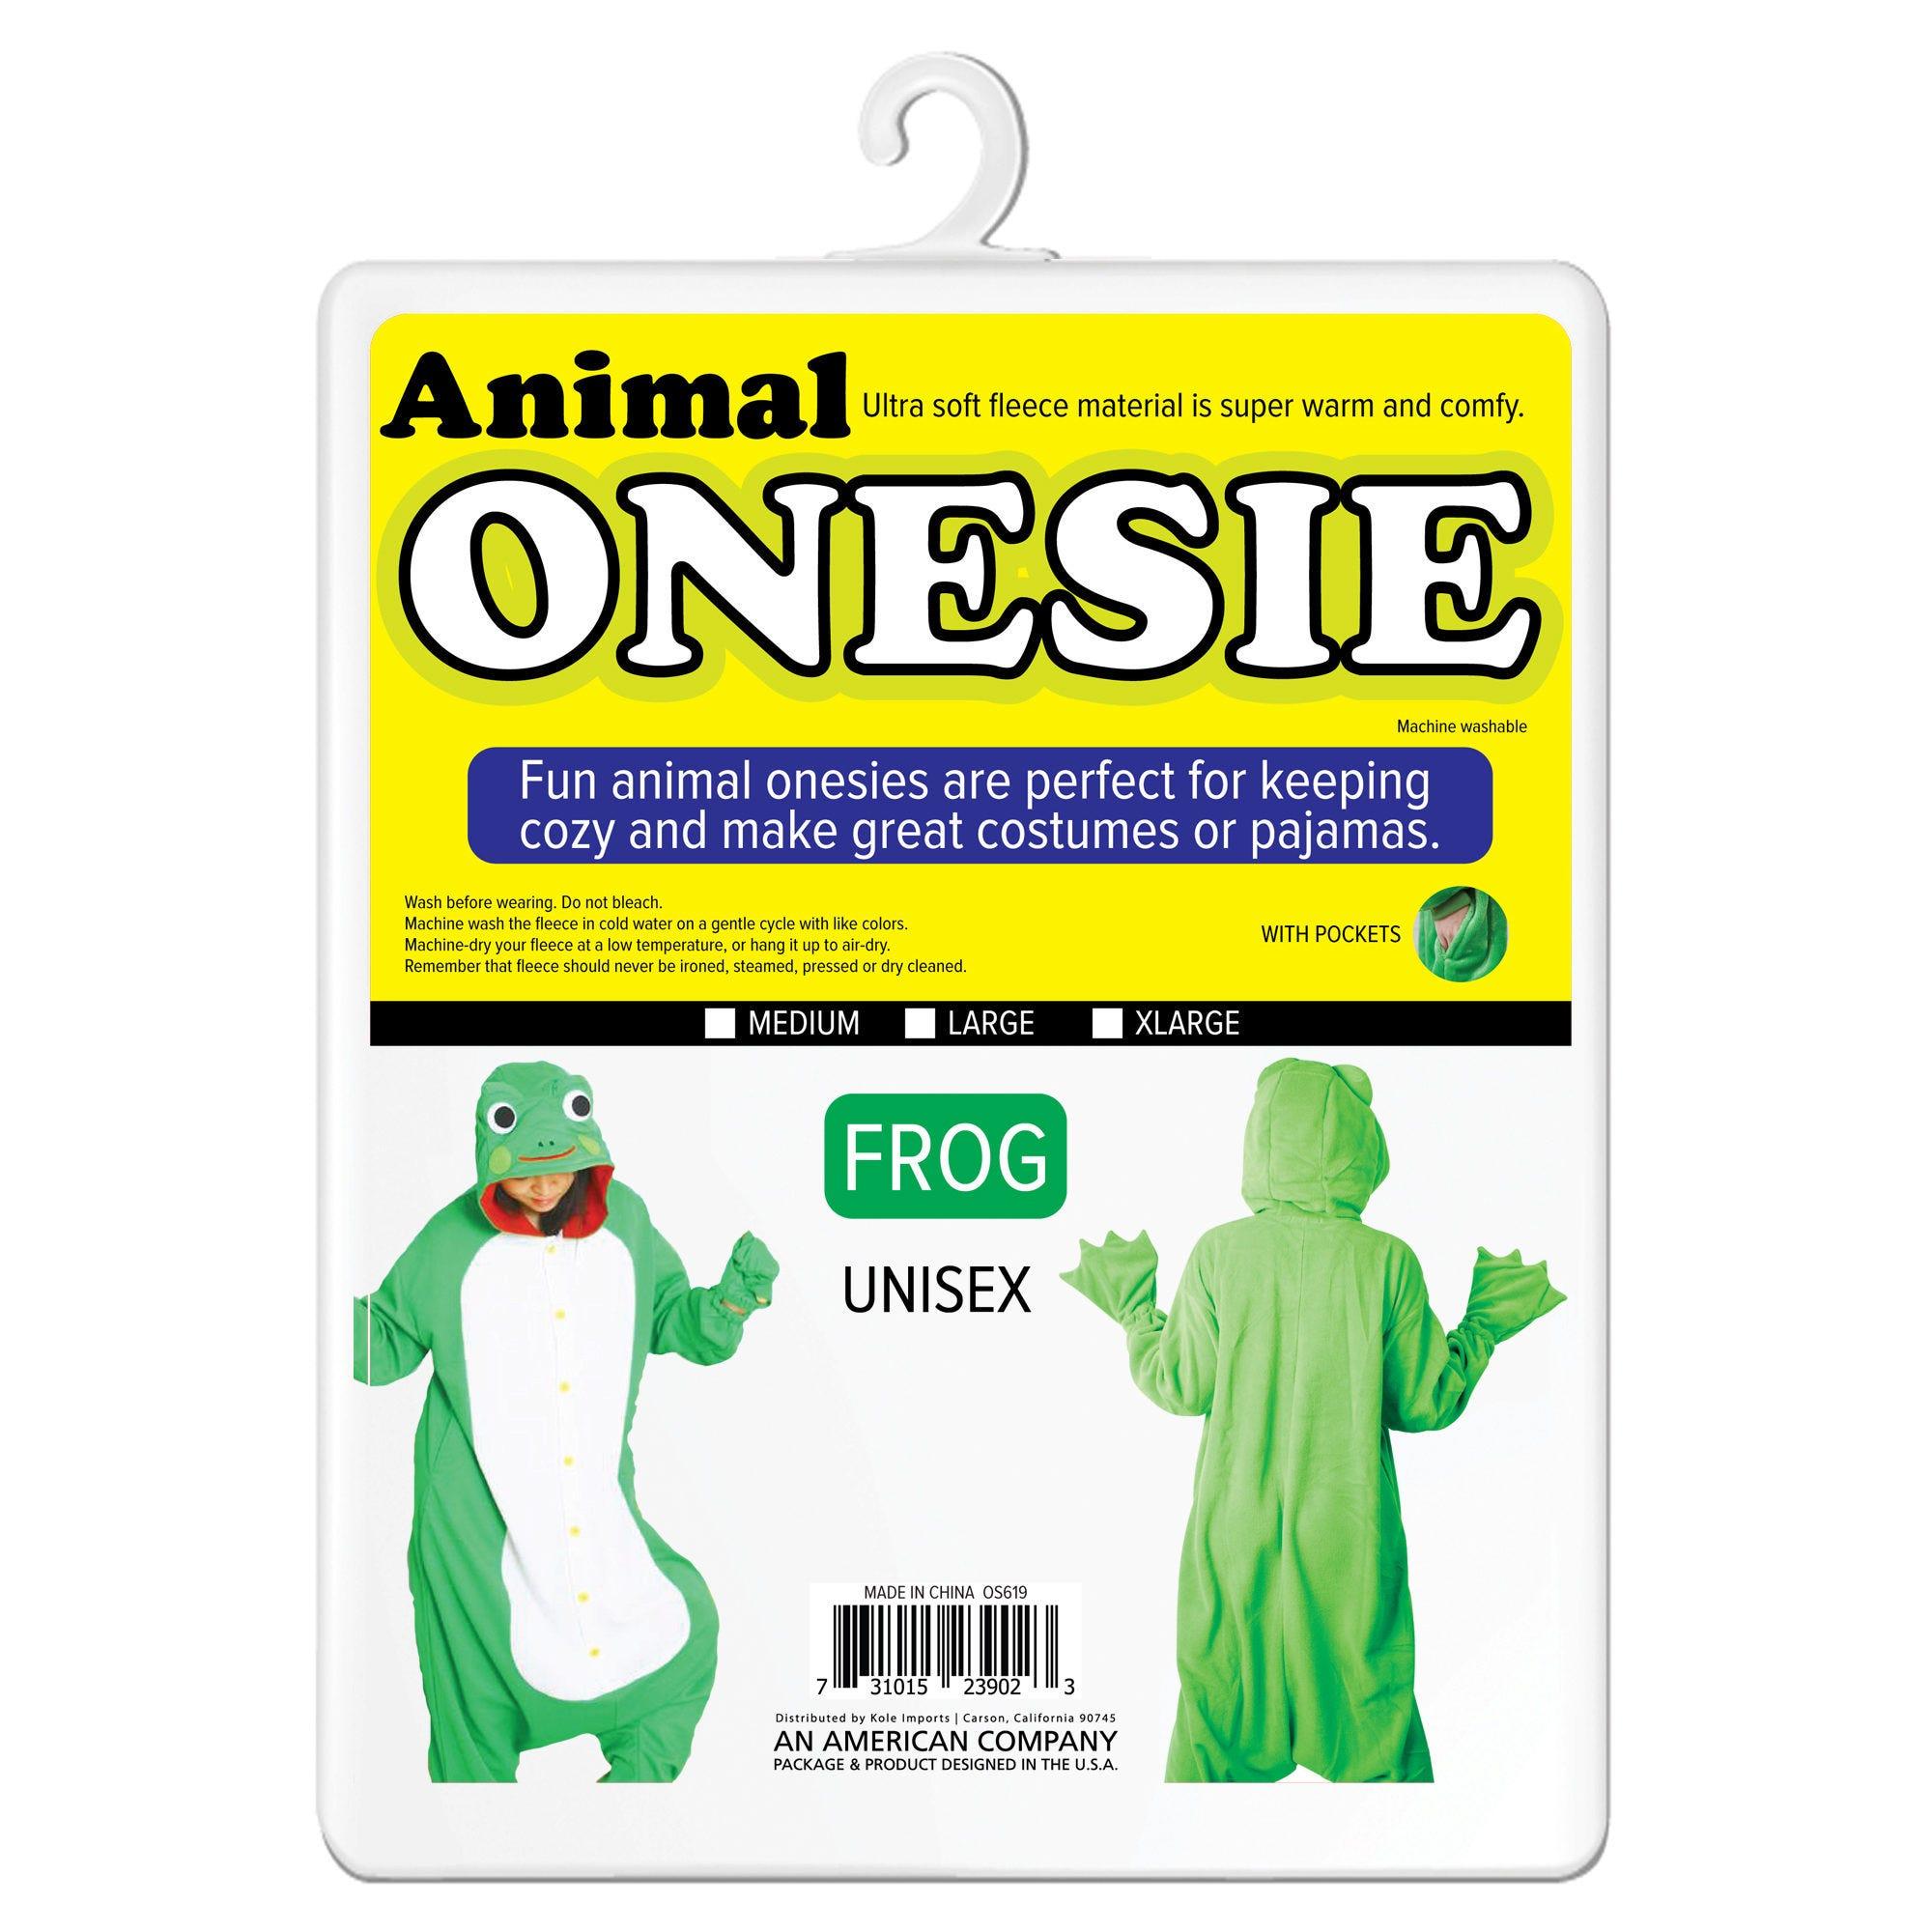 Bee & Frog Adult Unisex Animal Onesie- Qty 2